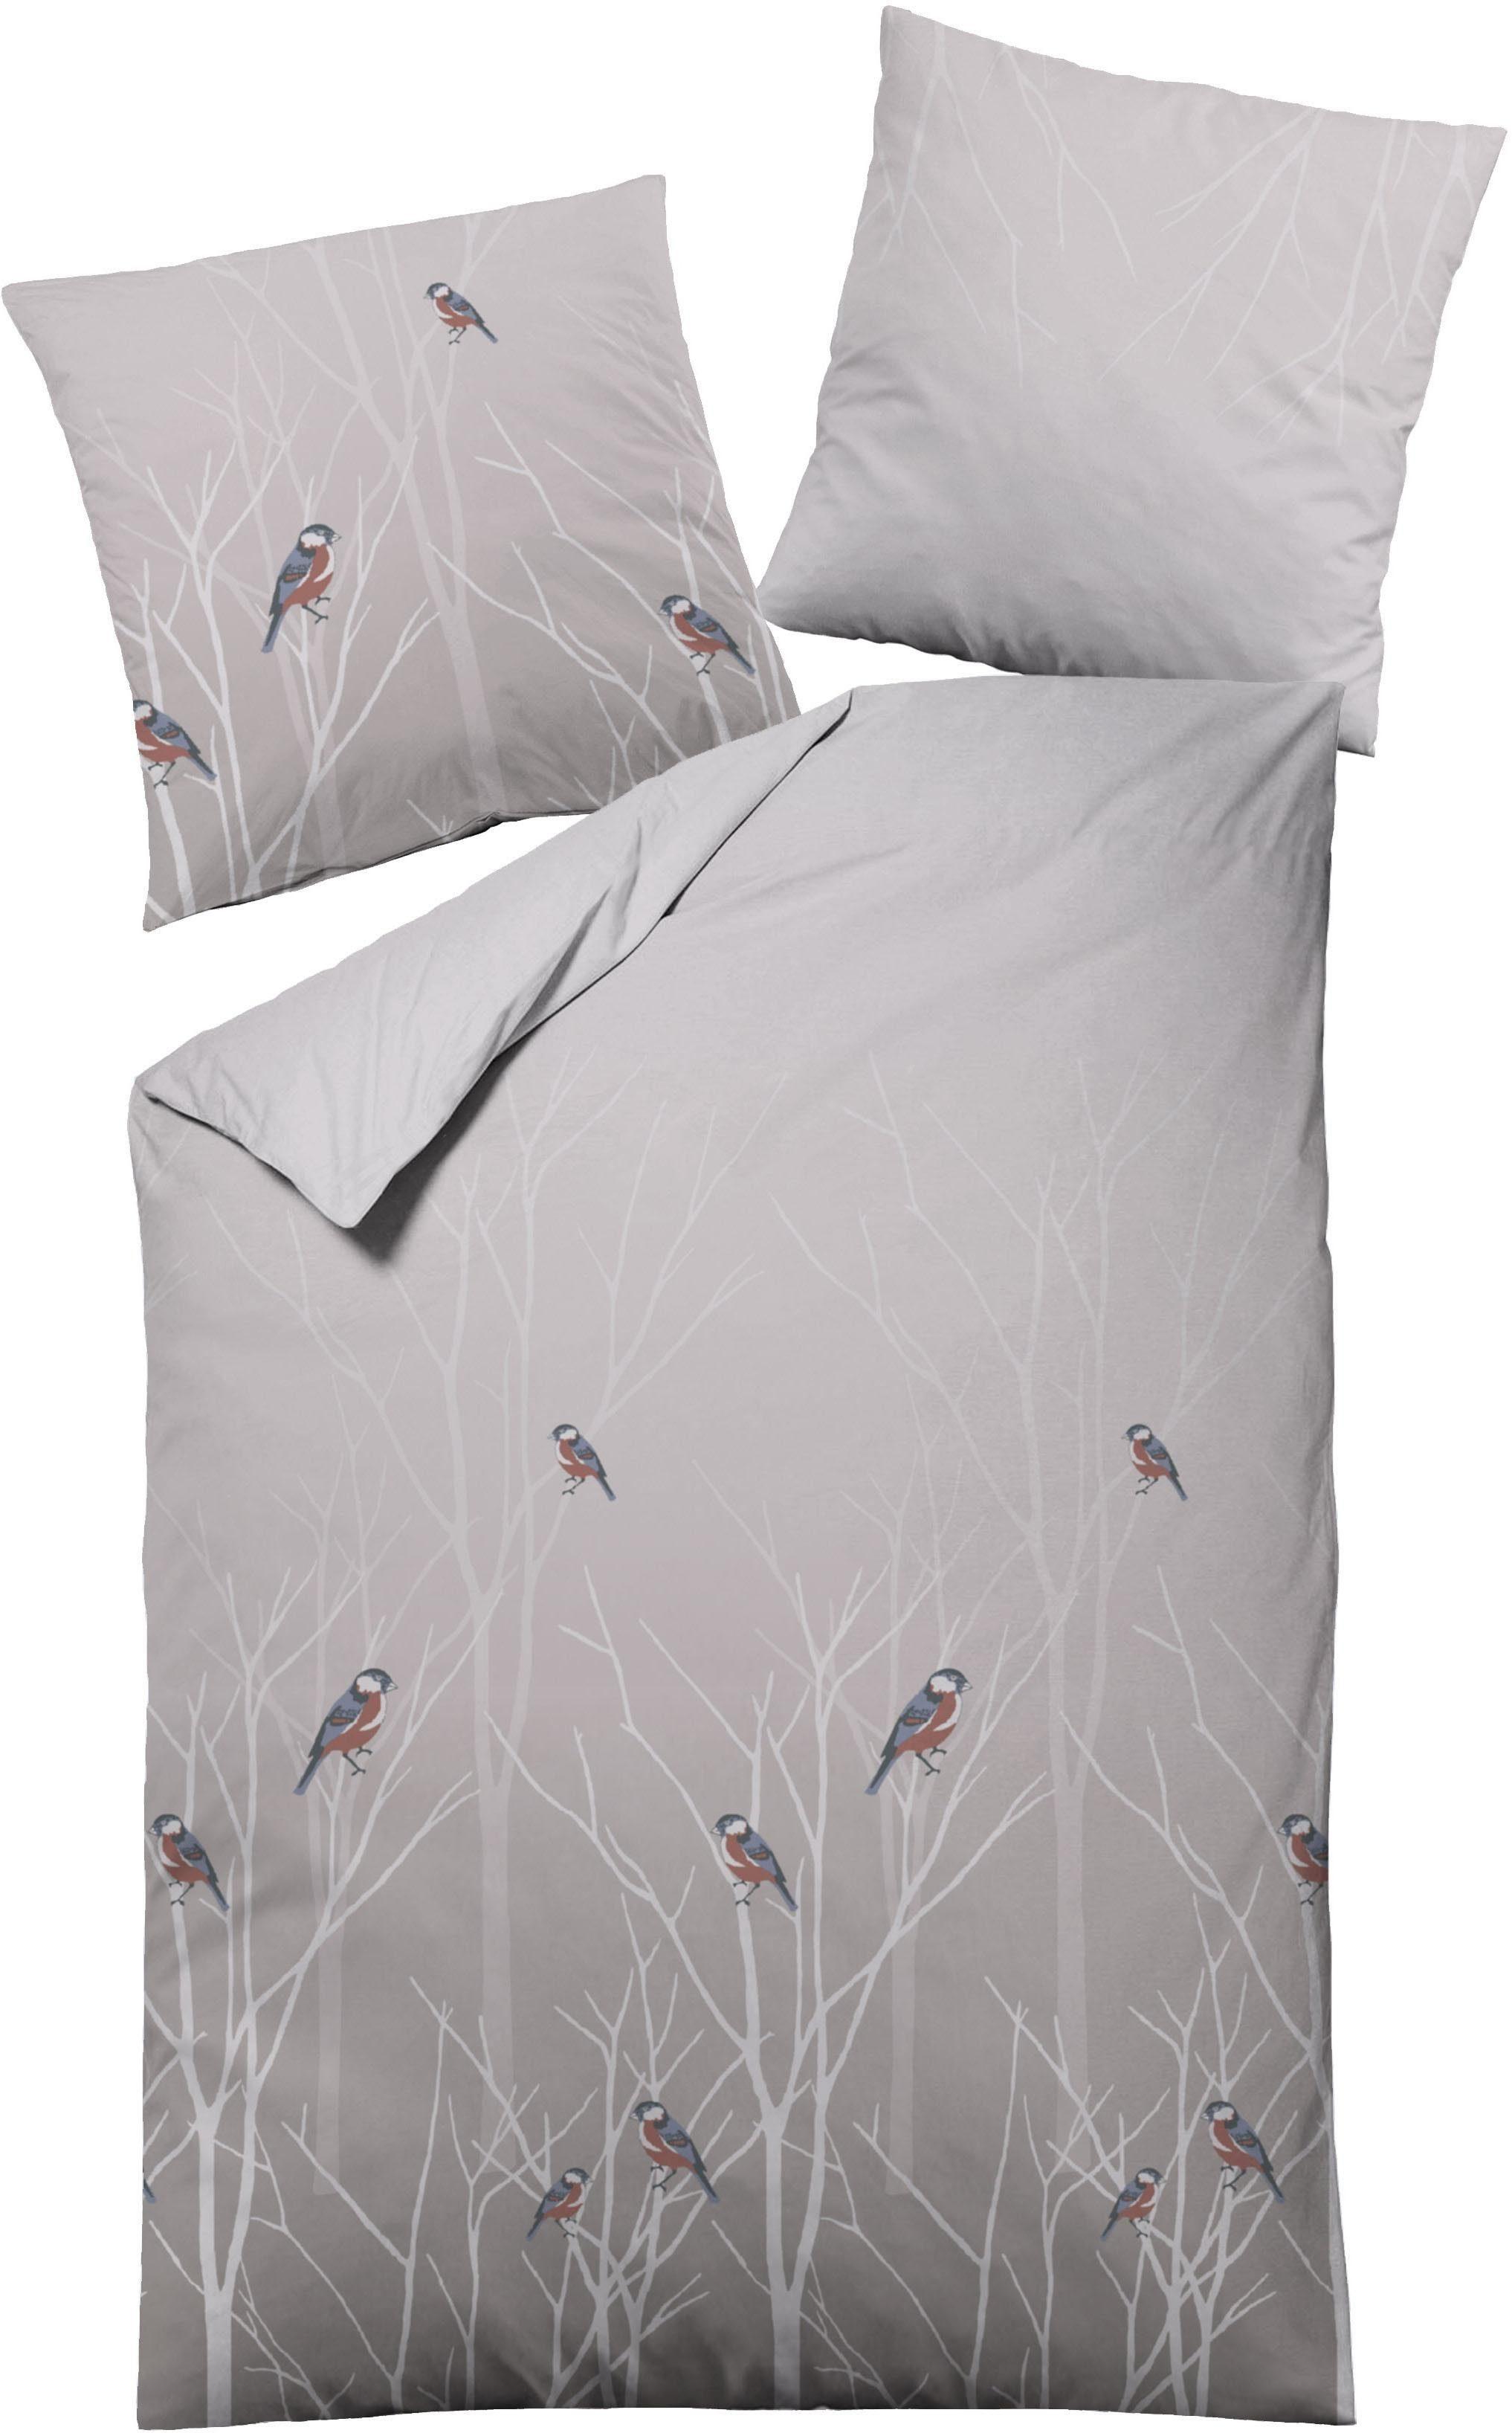 Bettwäsche Vögel Dormisette